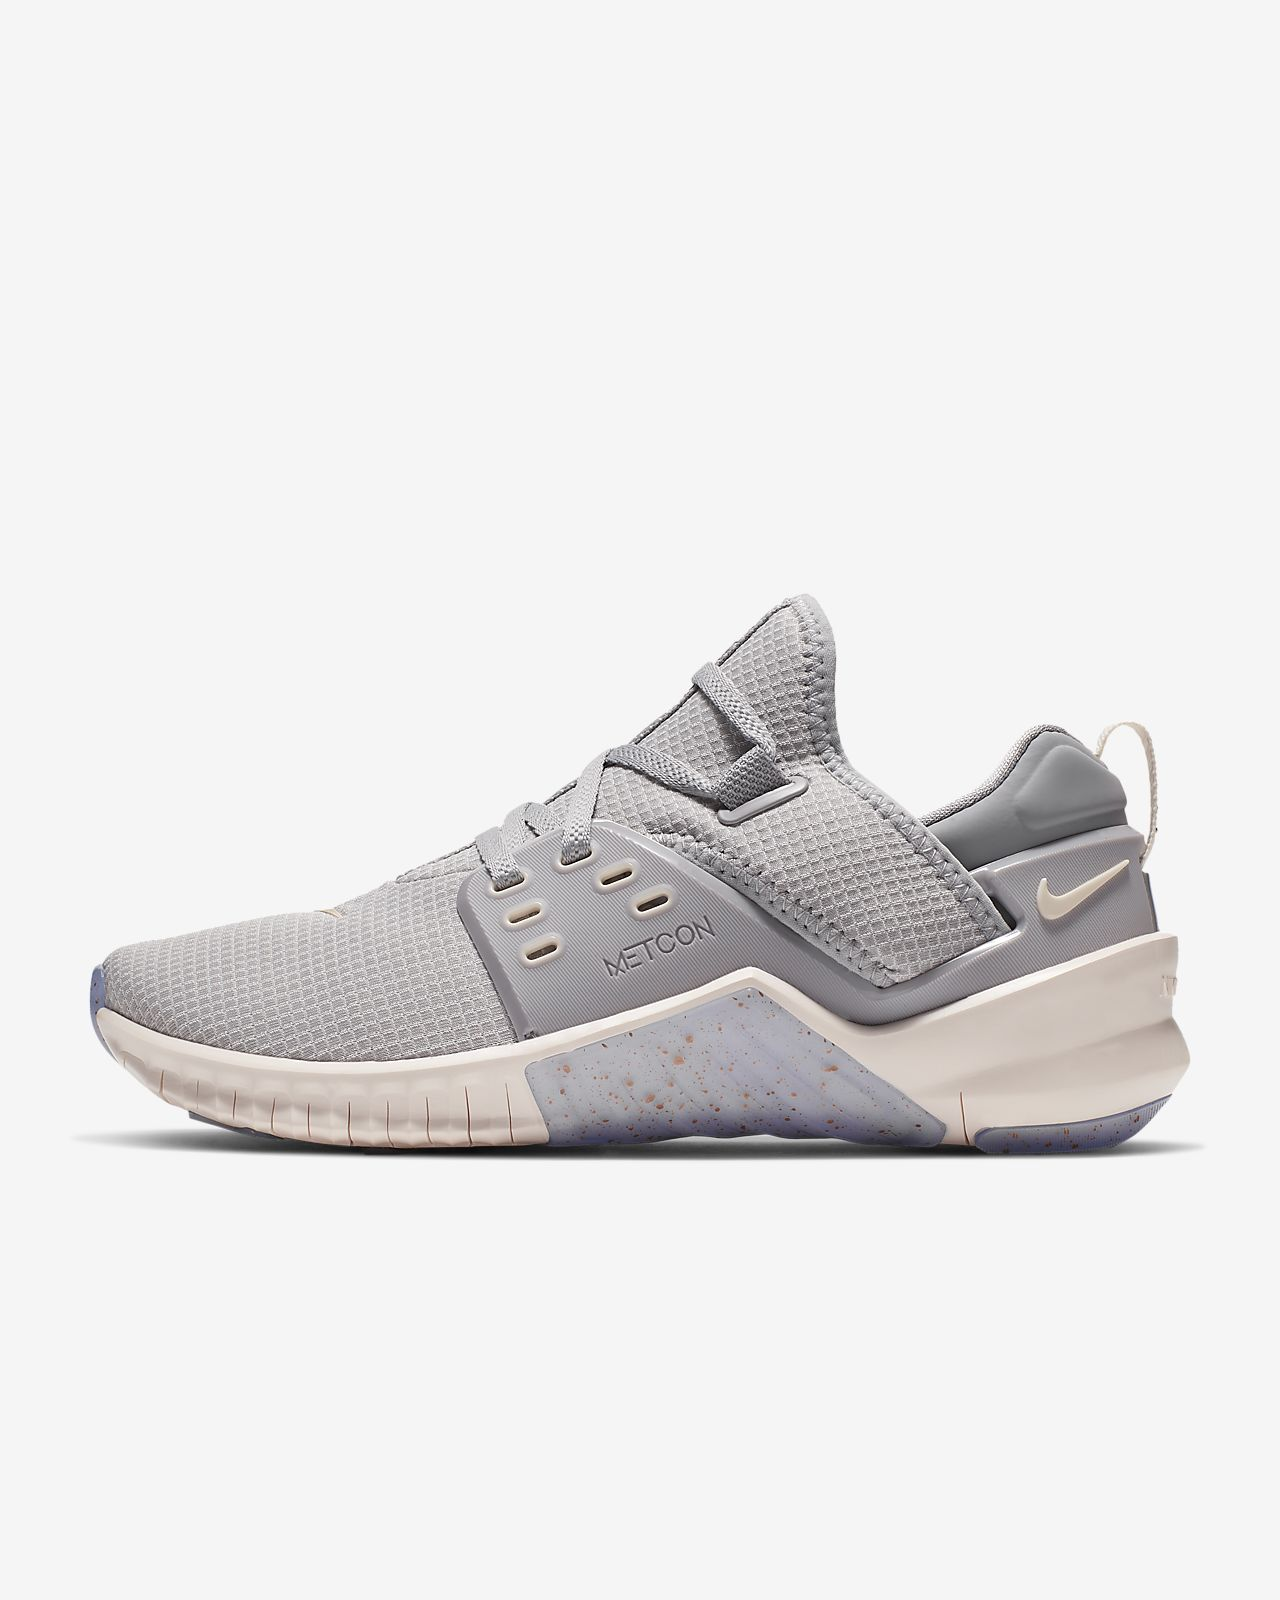 new product 645d9 9f497 Chaussure de training Nike Free X Metcon 2 pour Femme. Nike.com FR